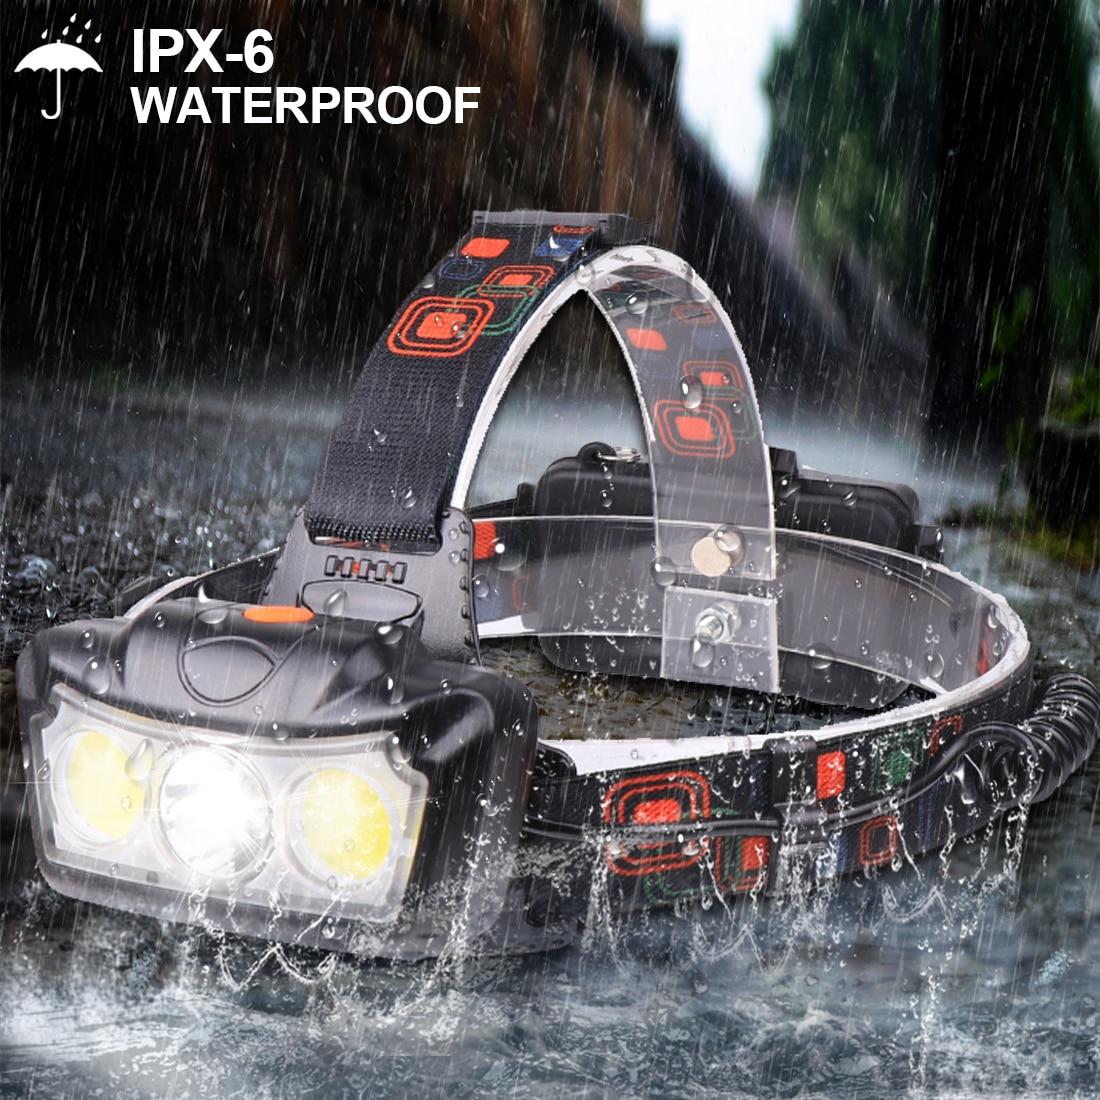 30000LM LED Headlamp T6+COB LED Headlight Head Lamp Flashlight Torch Lanterna Head Light Use 2*18650 Battery For Camping